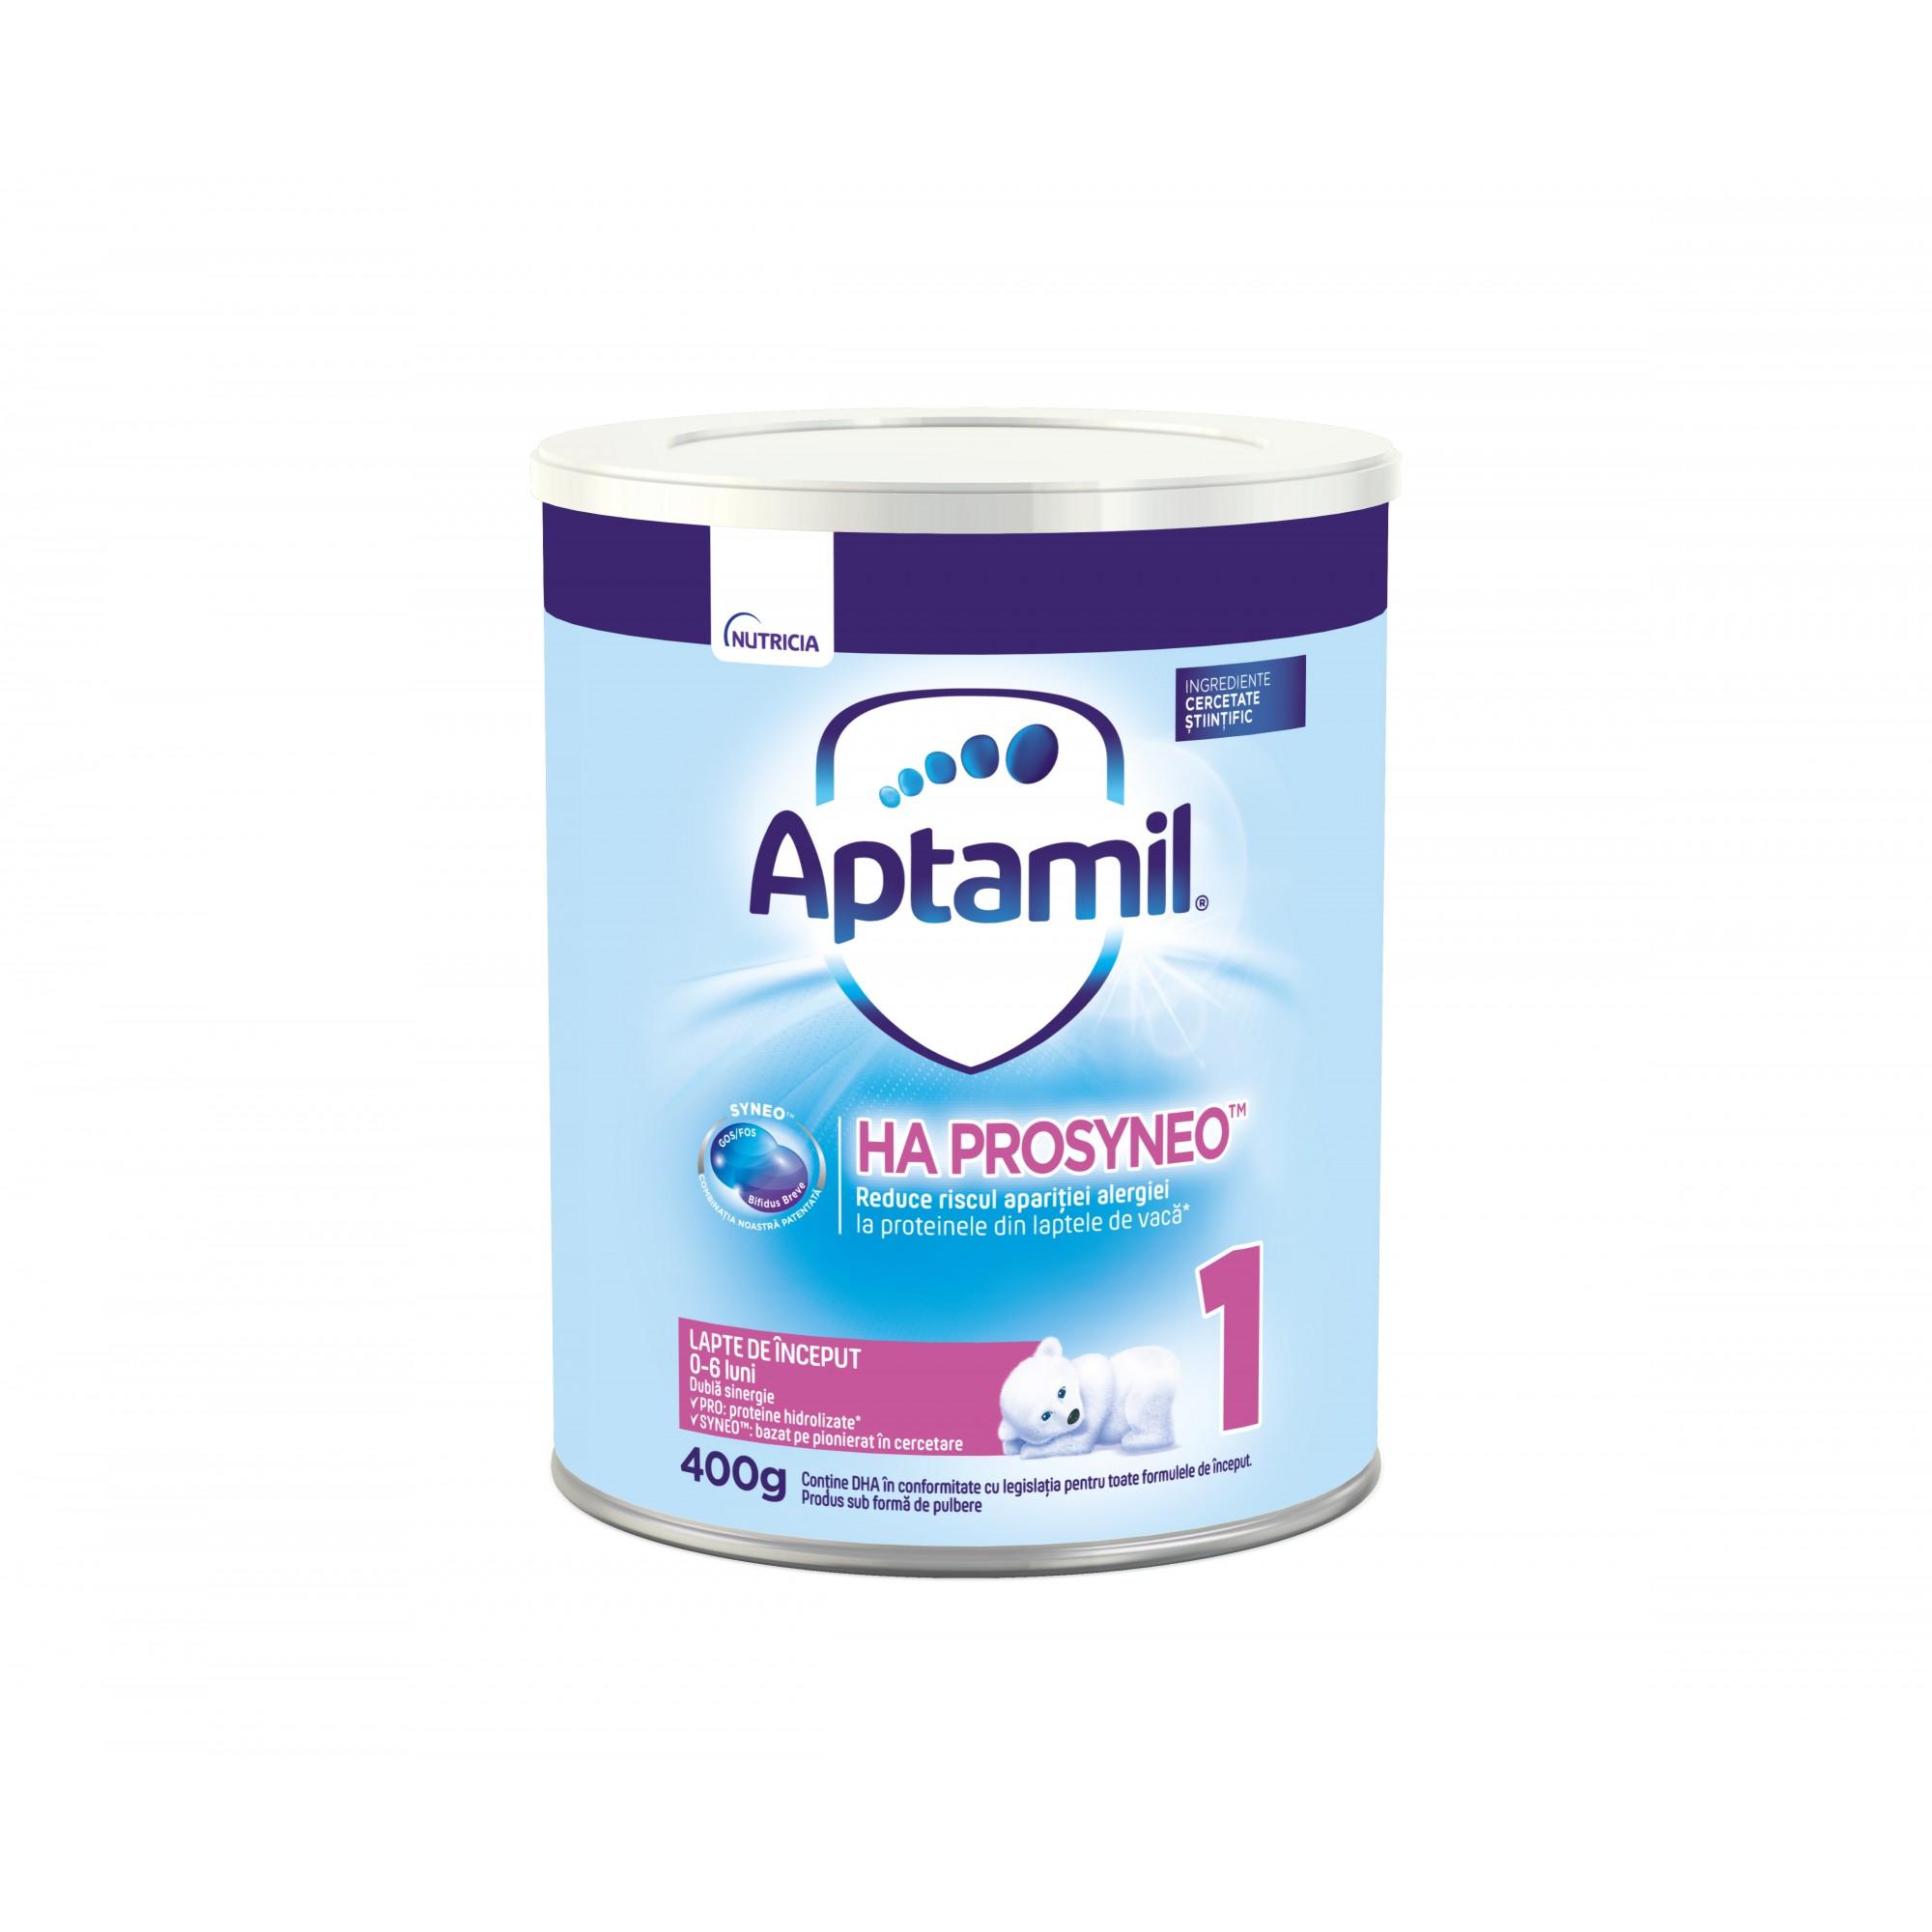 Lapte praf hipoalergenic Nutricia, Aptamil HA1 Prosynevo, 400G, 0-6 luni